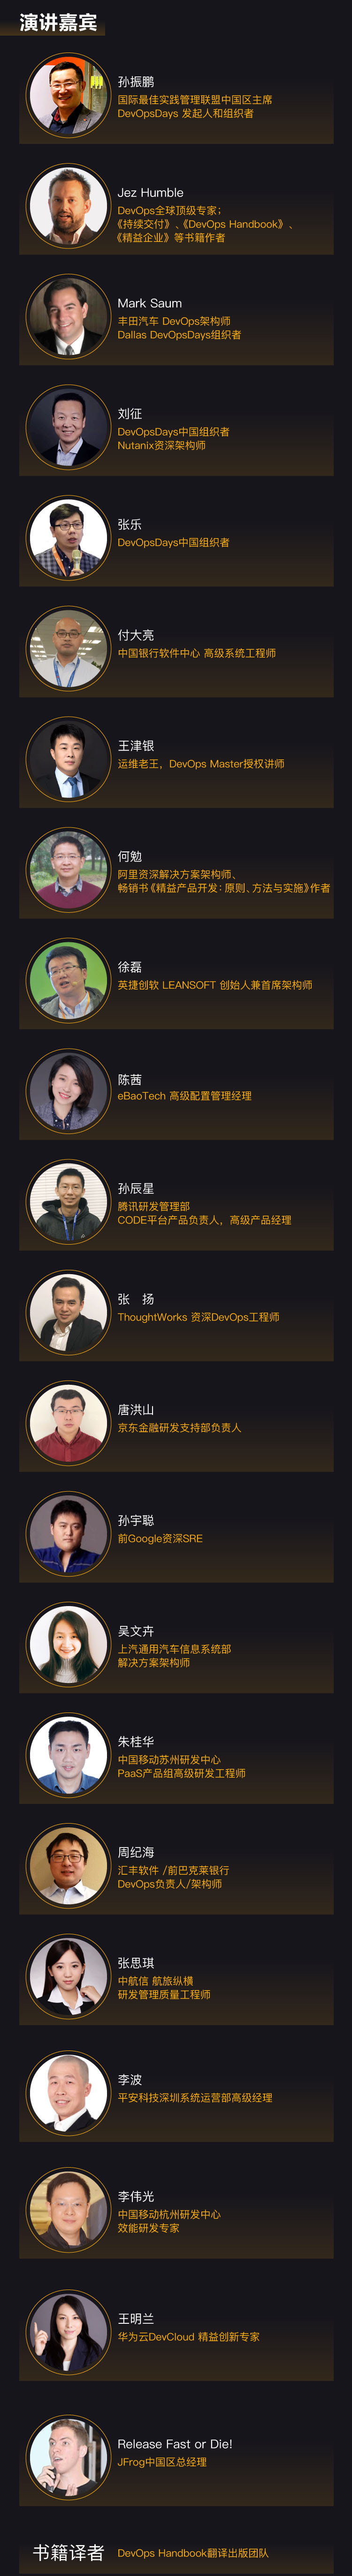 DevOpsDays Beijing 2018leangoo演讲嘉宾